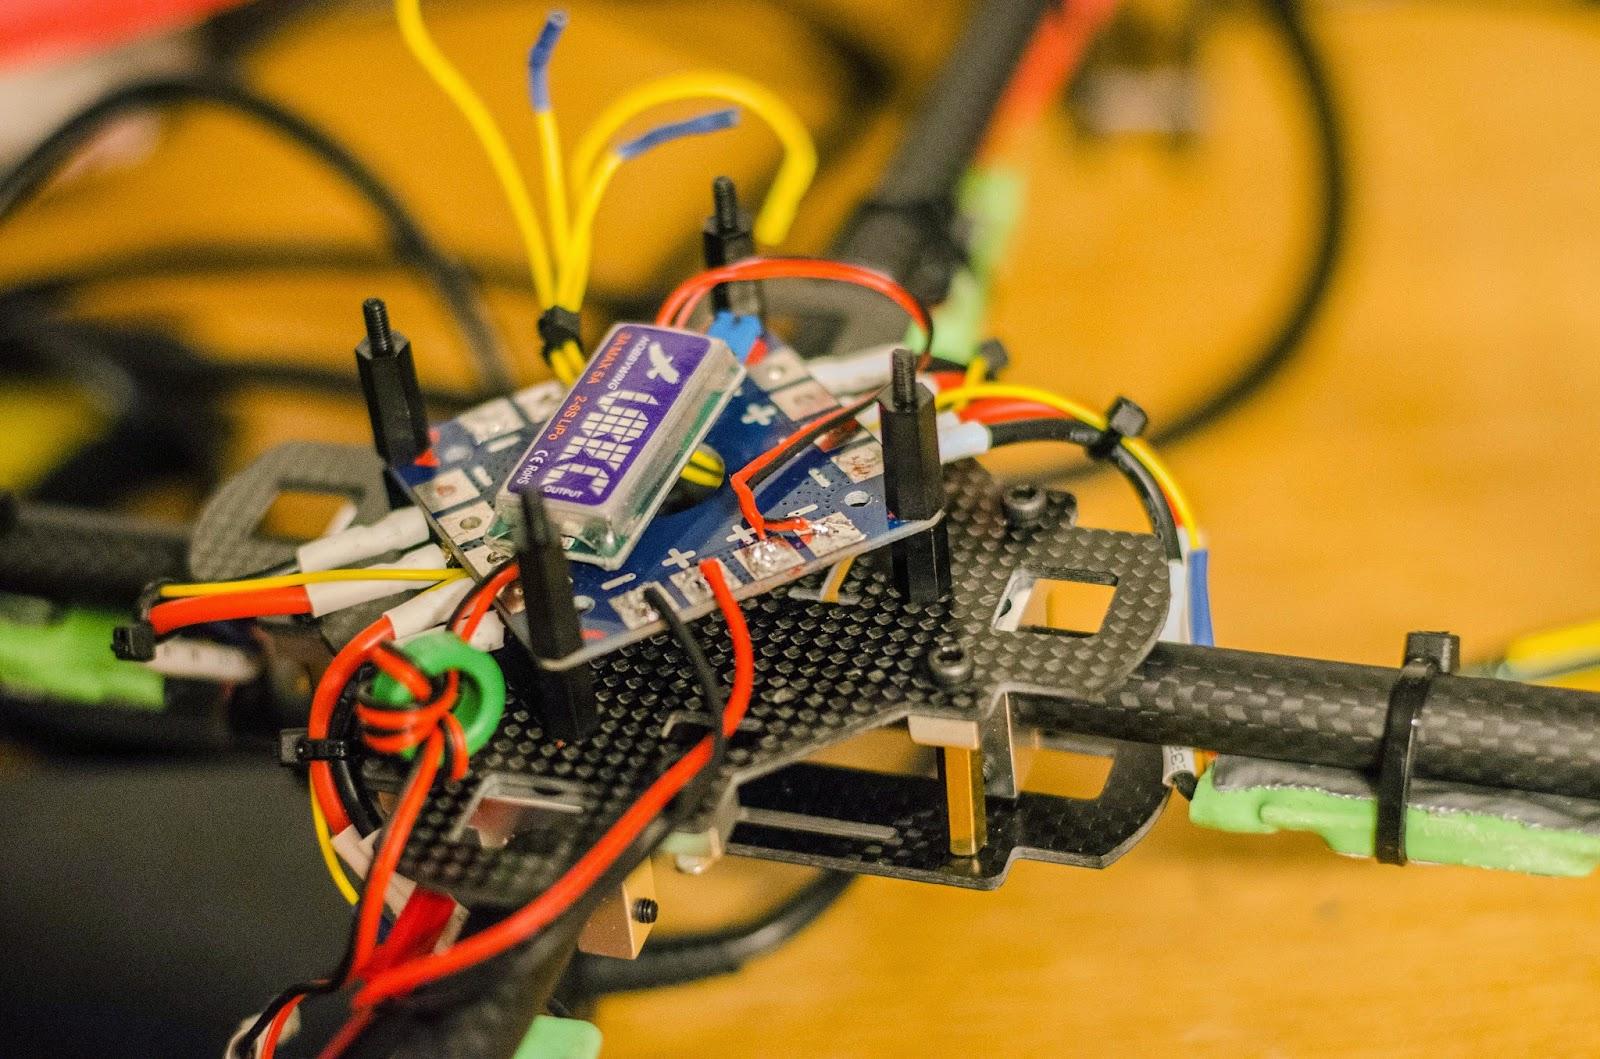 orangerx kk2 wiring diagram [ 1600 x 1059 Pixel ]